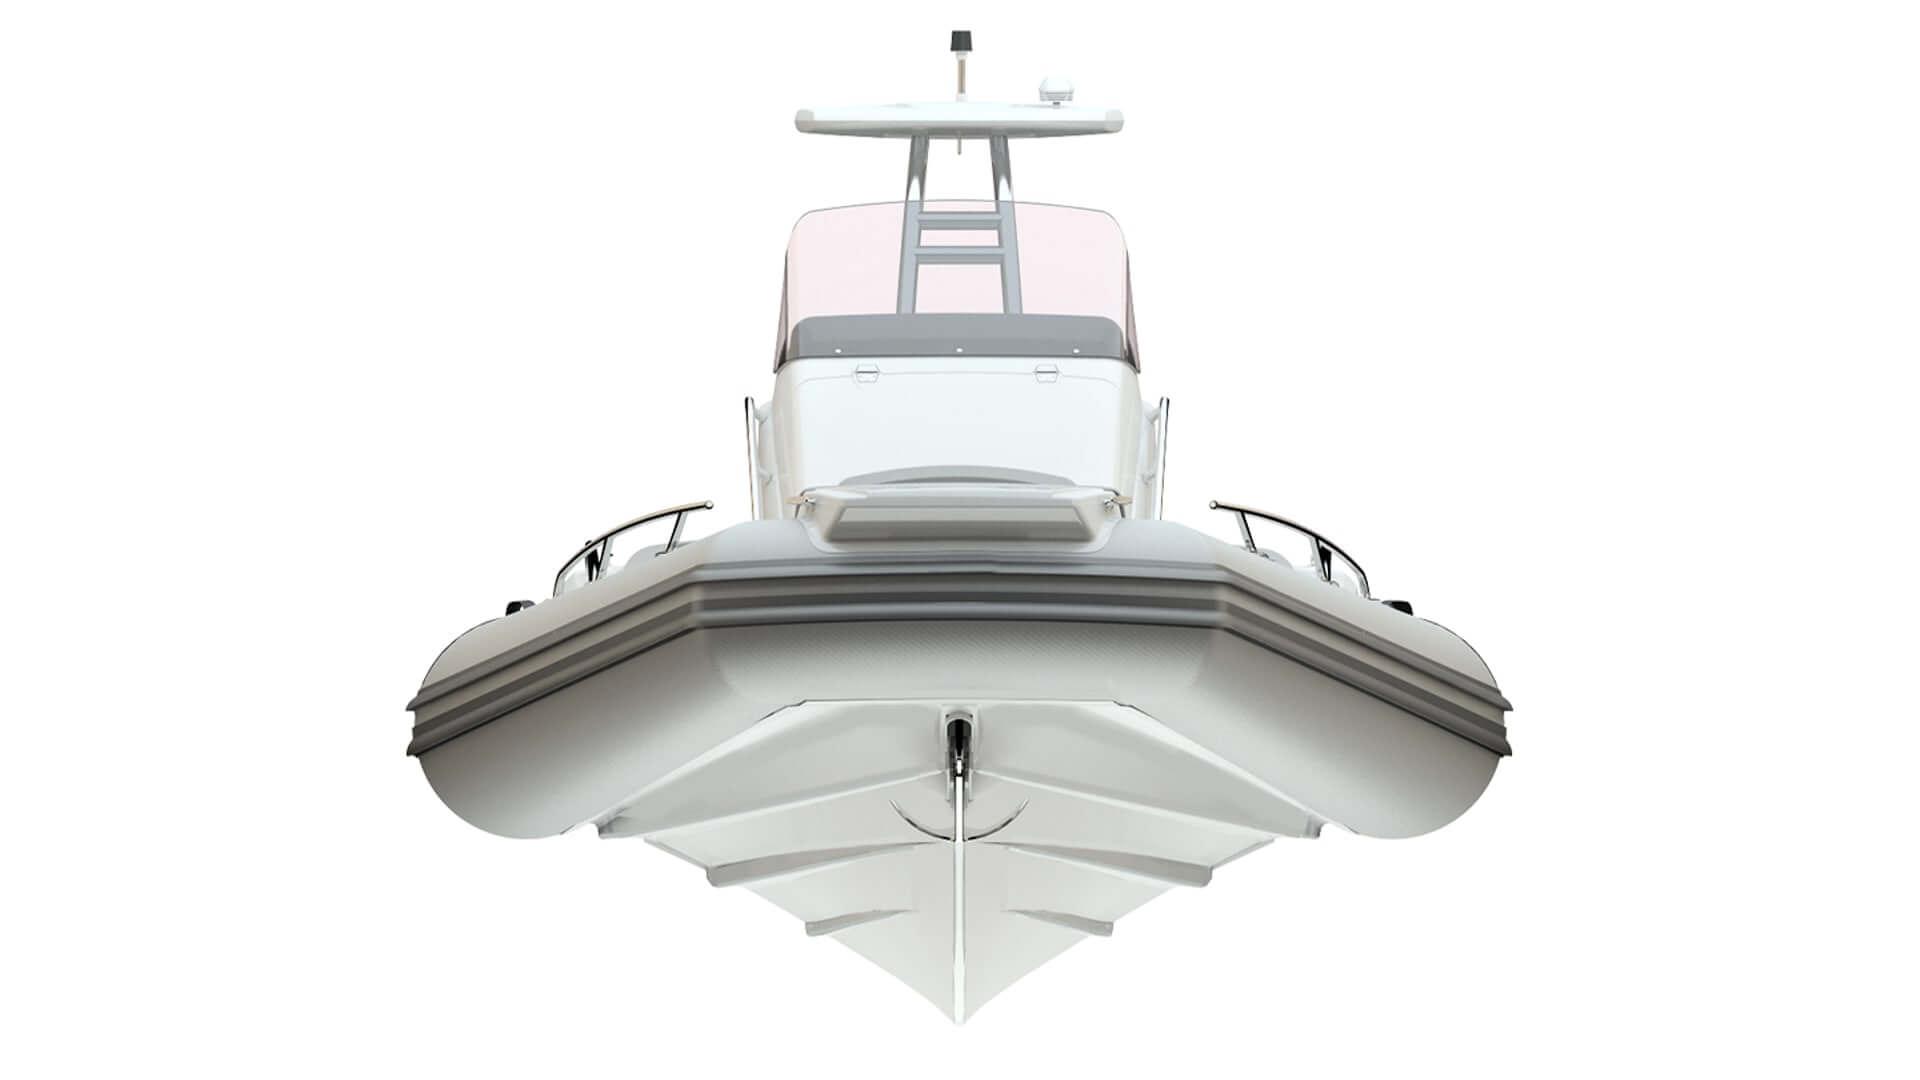 Grand Golden Line G850GHL, Grand Golden Line G850, Golden Line G850, GRAND G850, G850, Надувная лодка GRAND Golden Line G850, Надувная лодка GRAND G850, Надувная лодка с жестким дном, Rigid Inflatable Boats, RIB